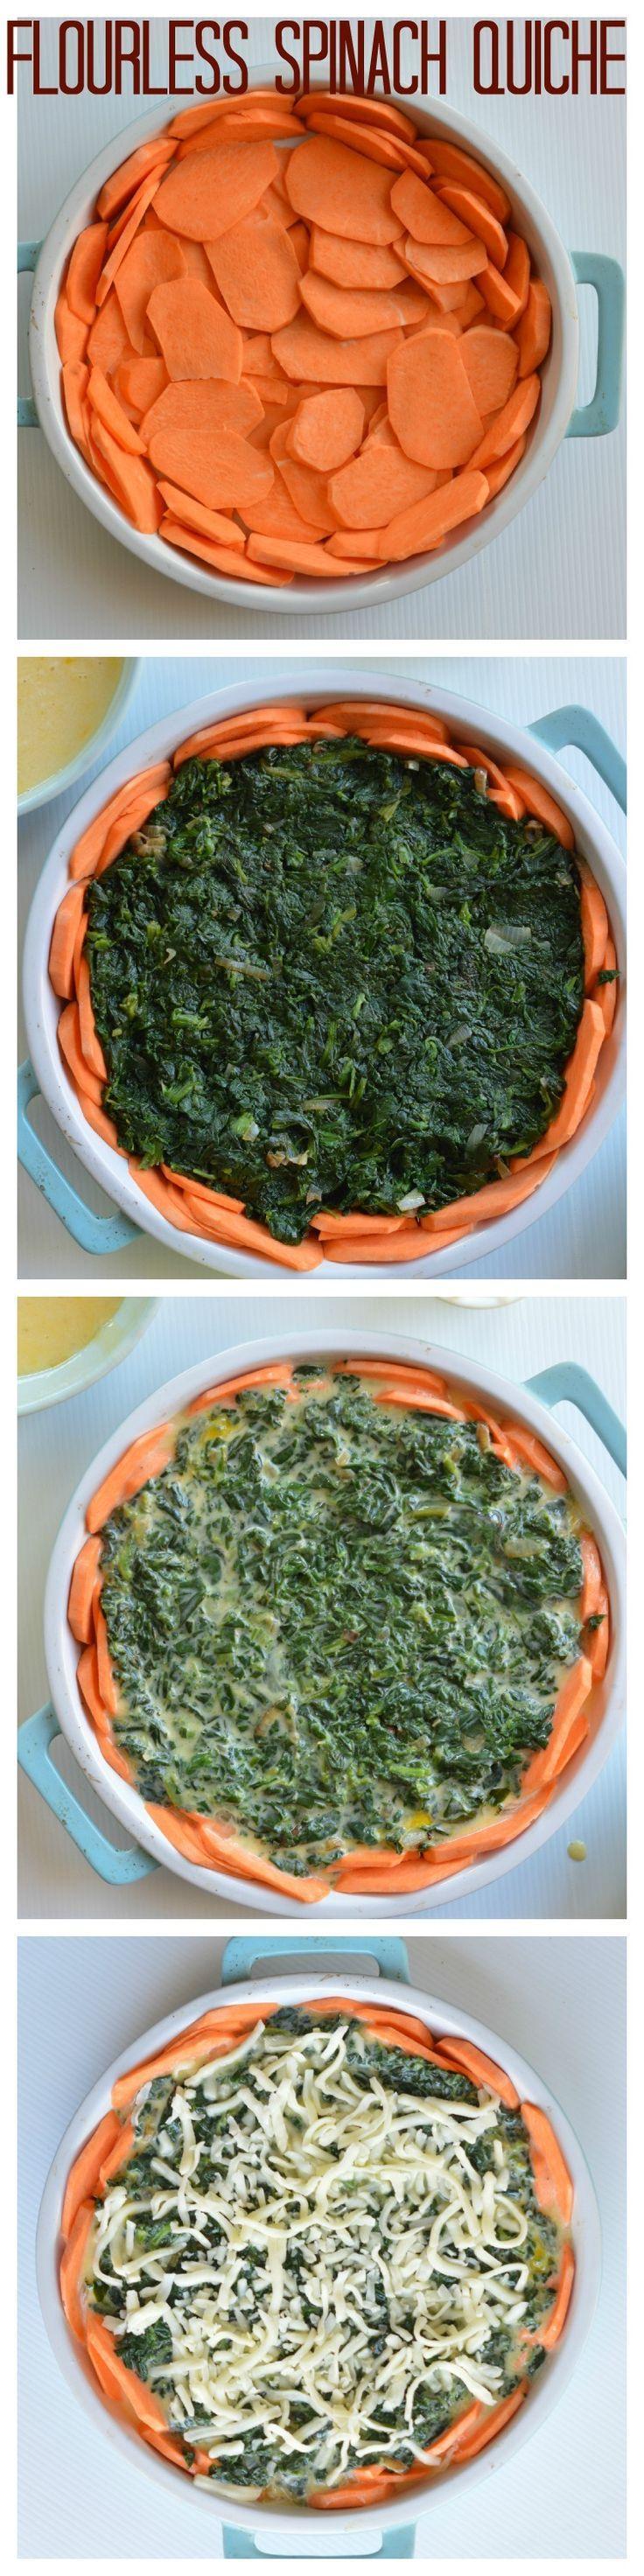 Flourless spinach quiche| clean eating quiche meals| sweet potato quiche| clean eating crustless quiche